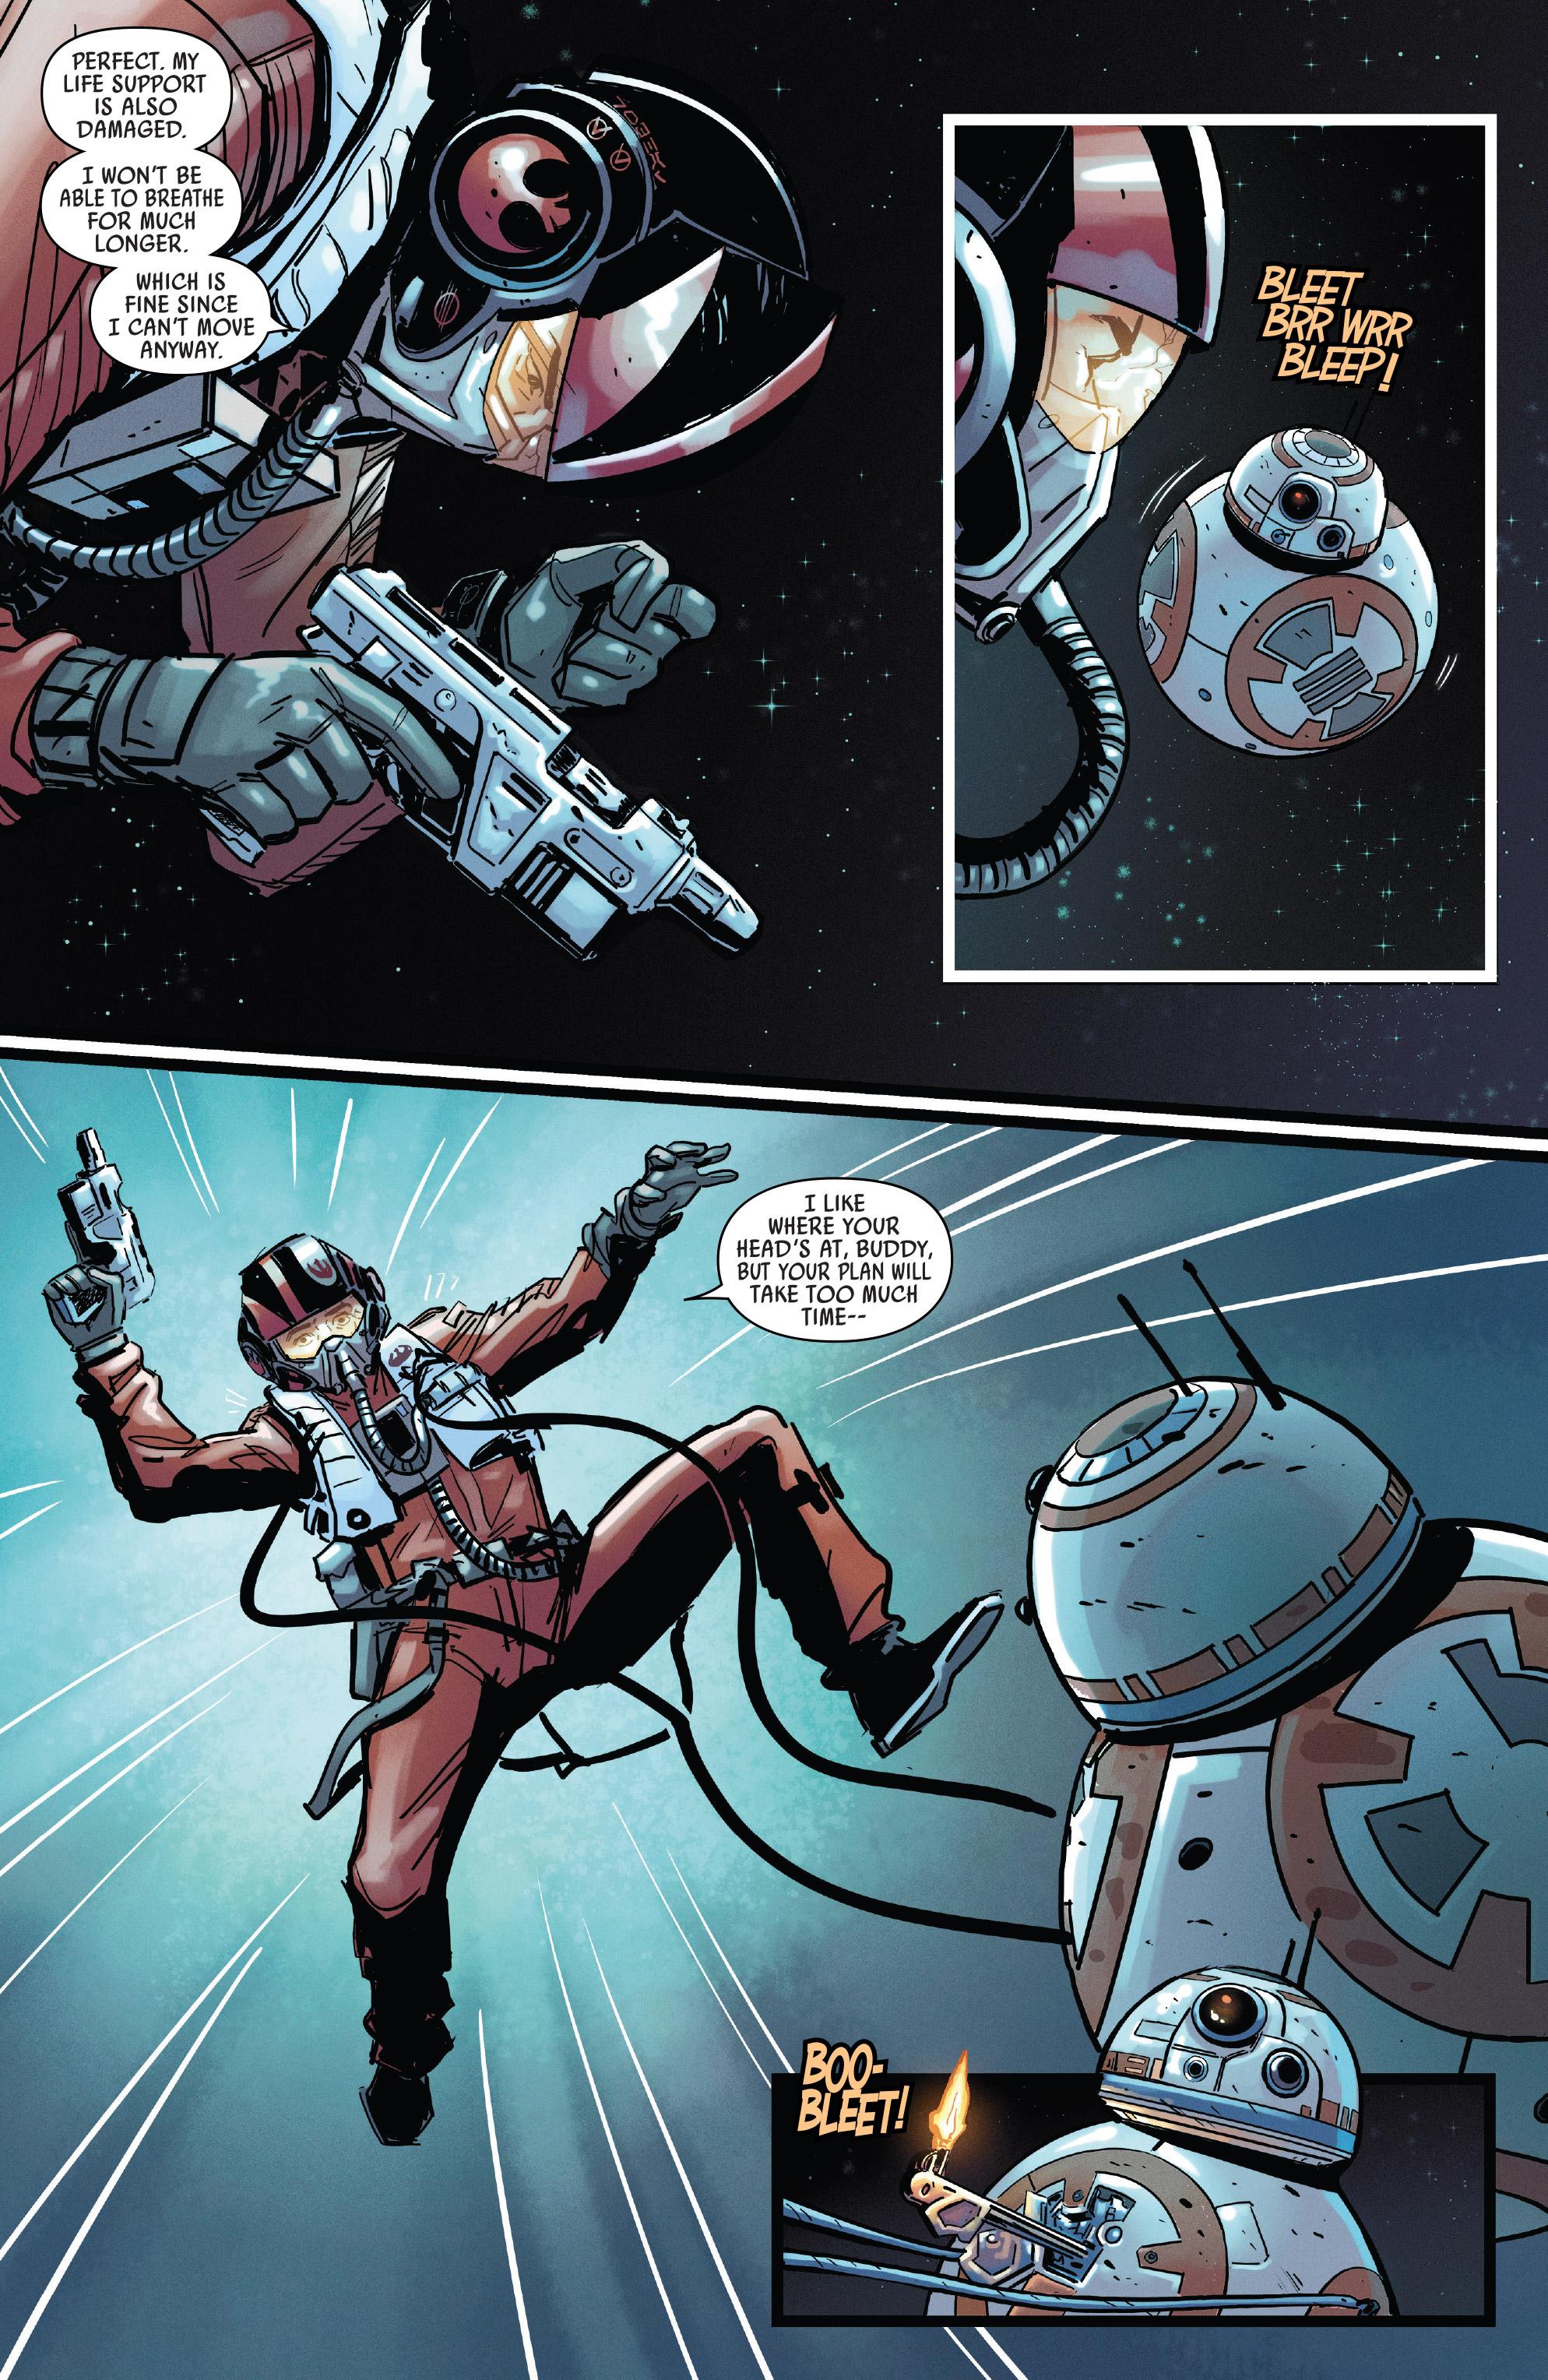 Read online Star Wars: Poe Dameron comic -  Issue # _Annual 1 - 8